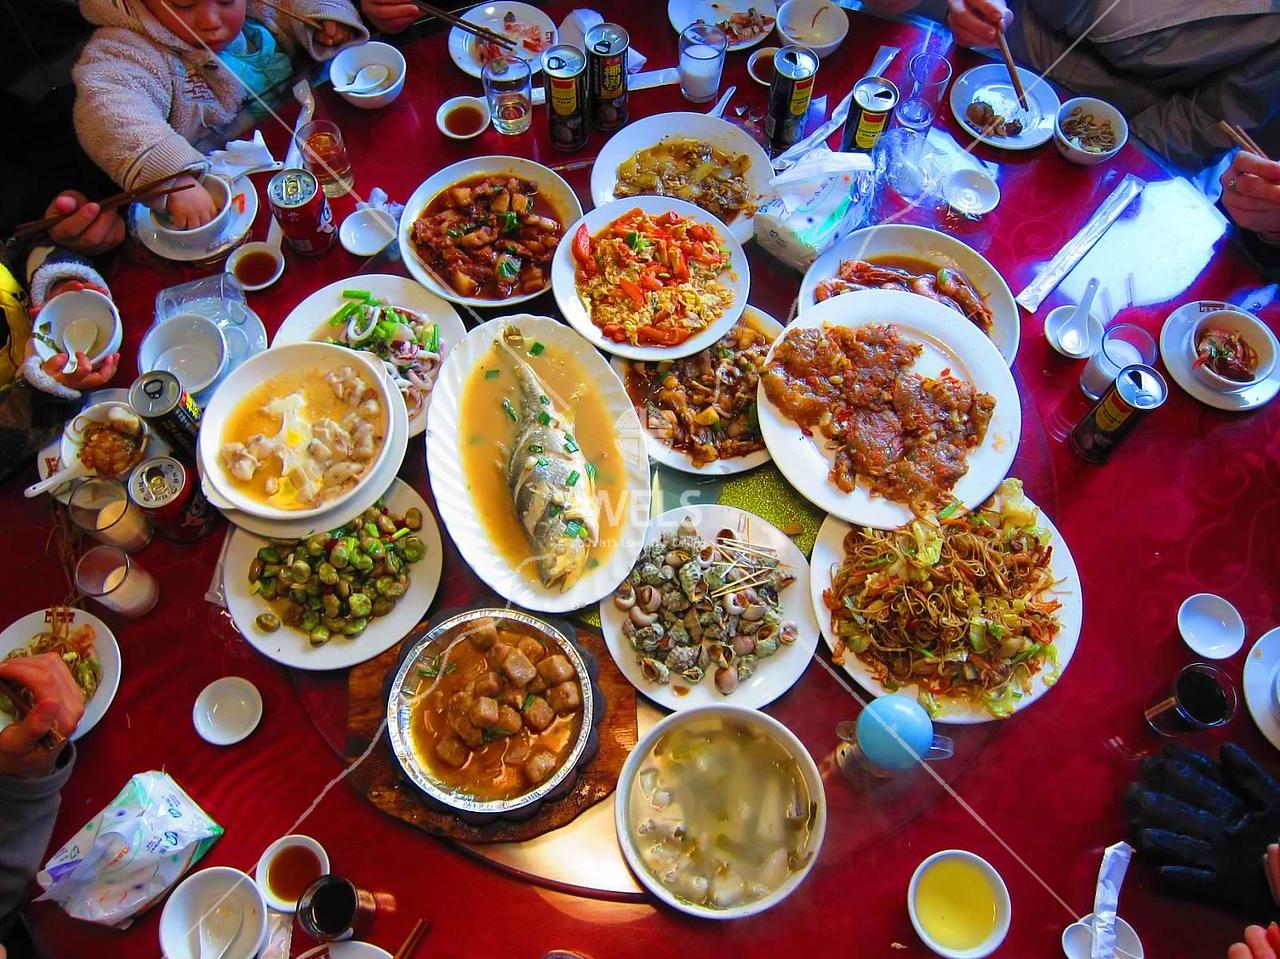 Chinese meal at restaurant, SE coastal village China by kstellick